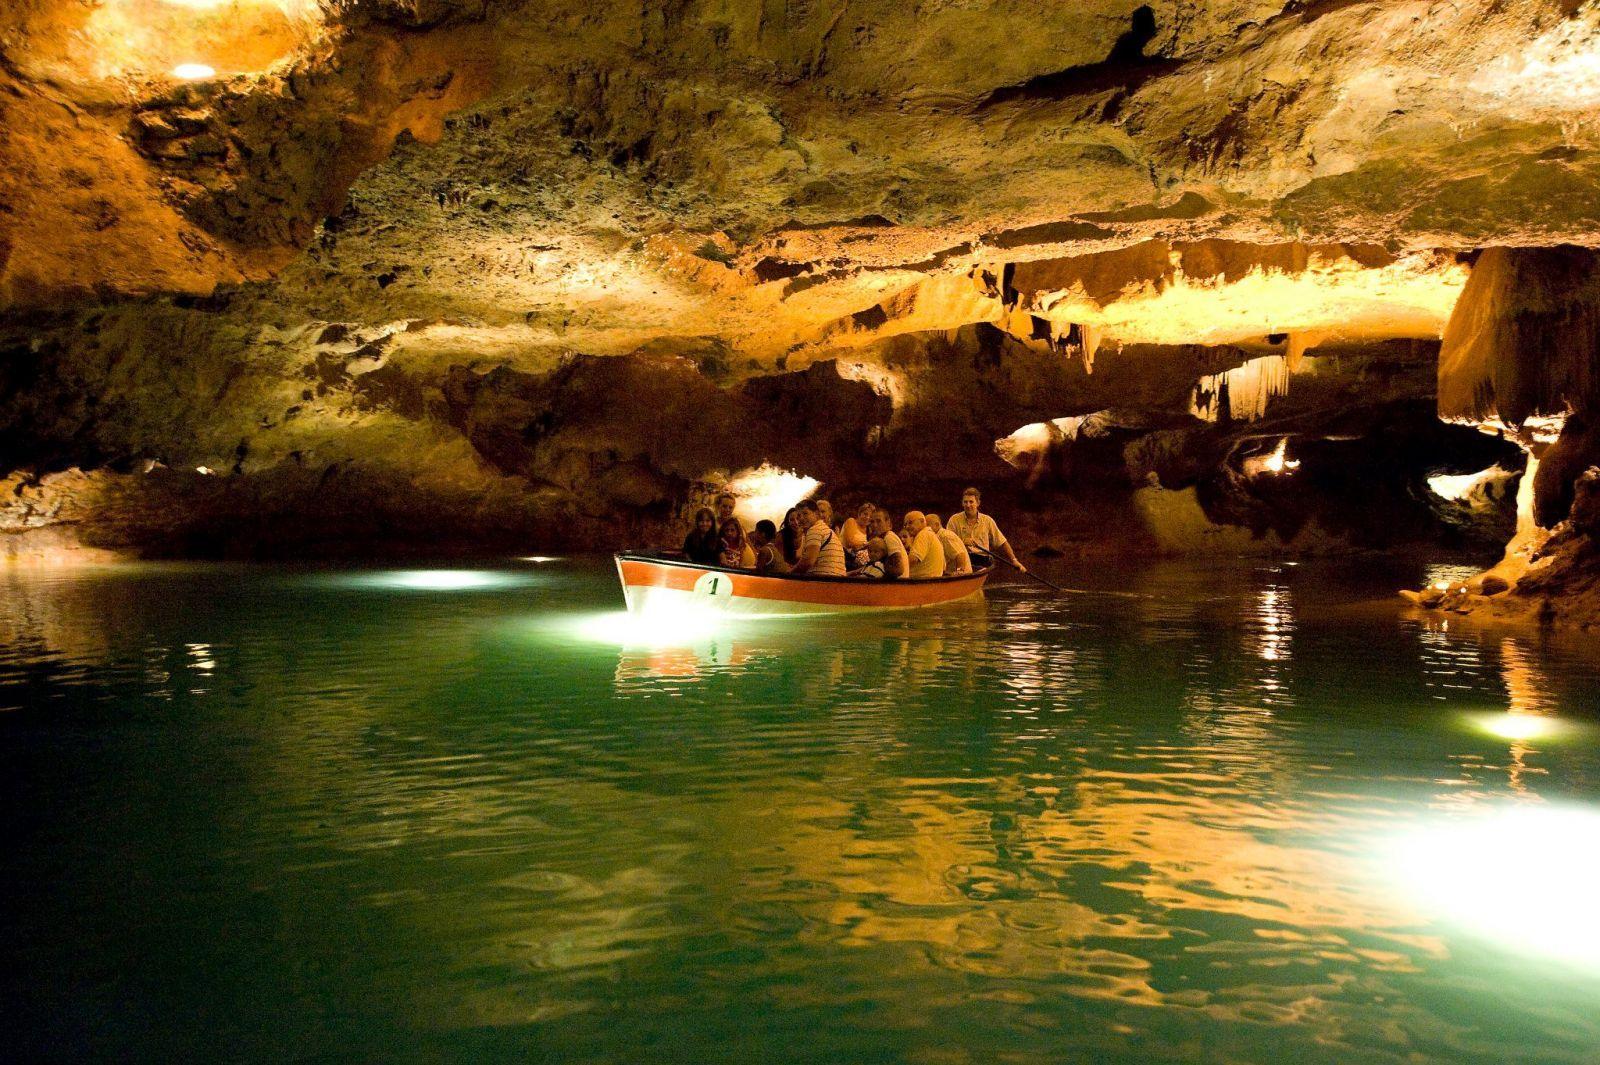 Río subterráneo de La Vall d' Uxó. A 10 Km. de Xilxes.